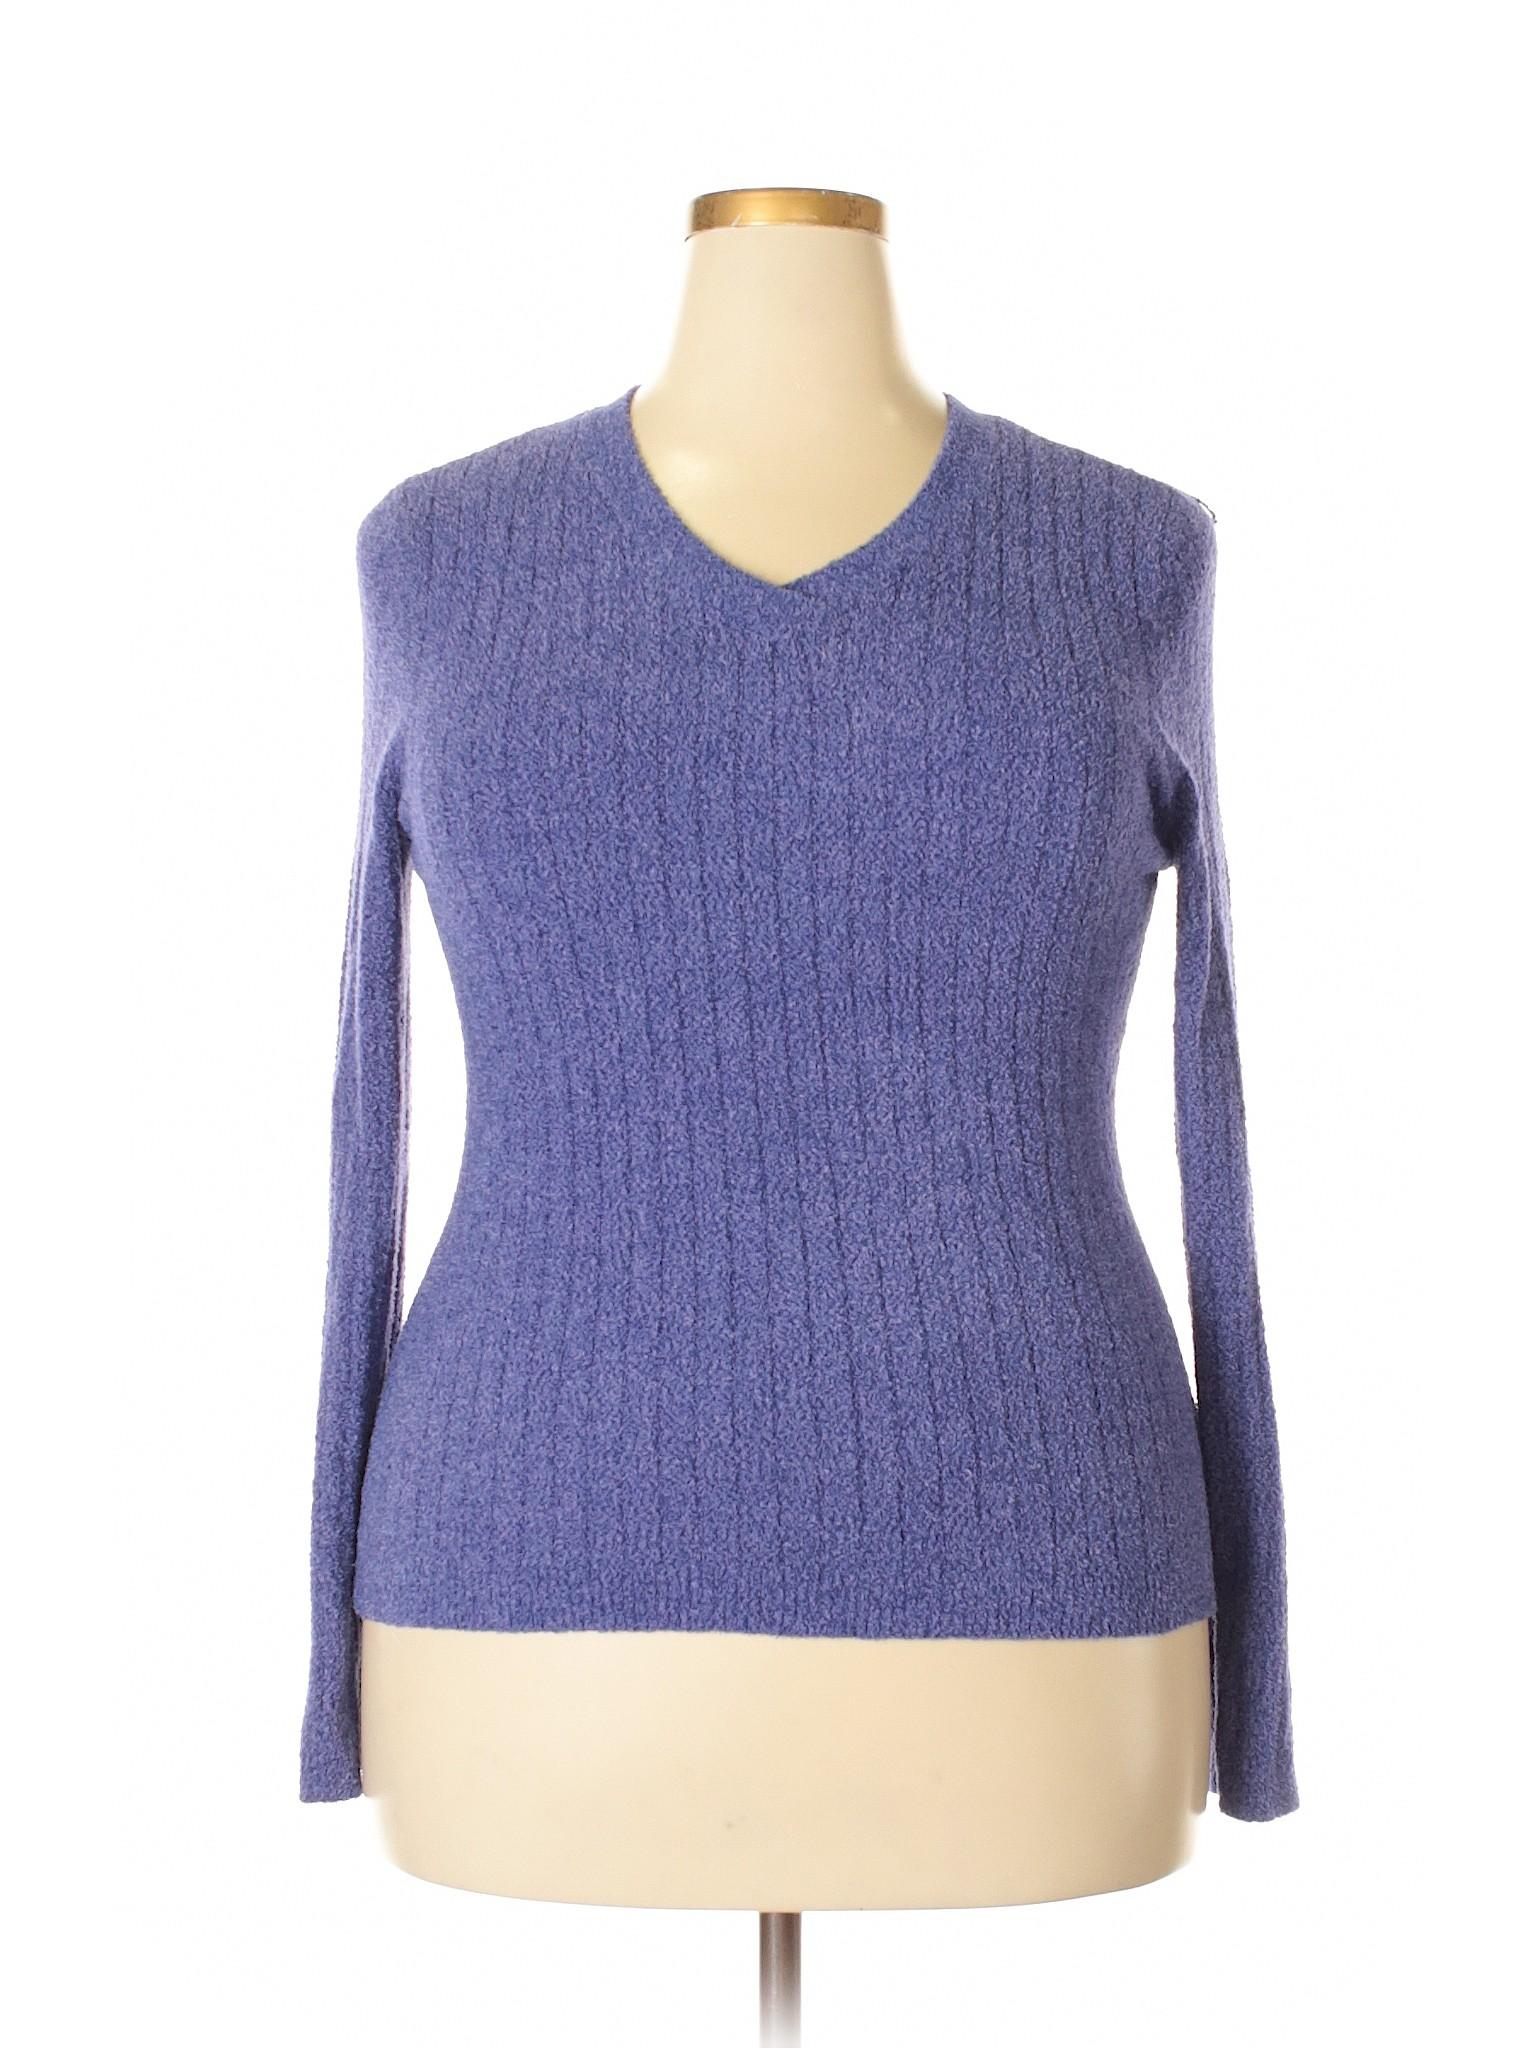 Pullover Barrow amp; winter Croft Boutique Sweater xY6Hff